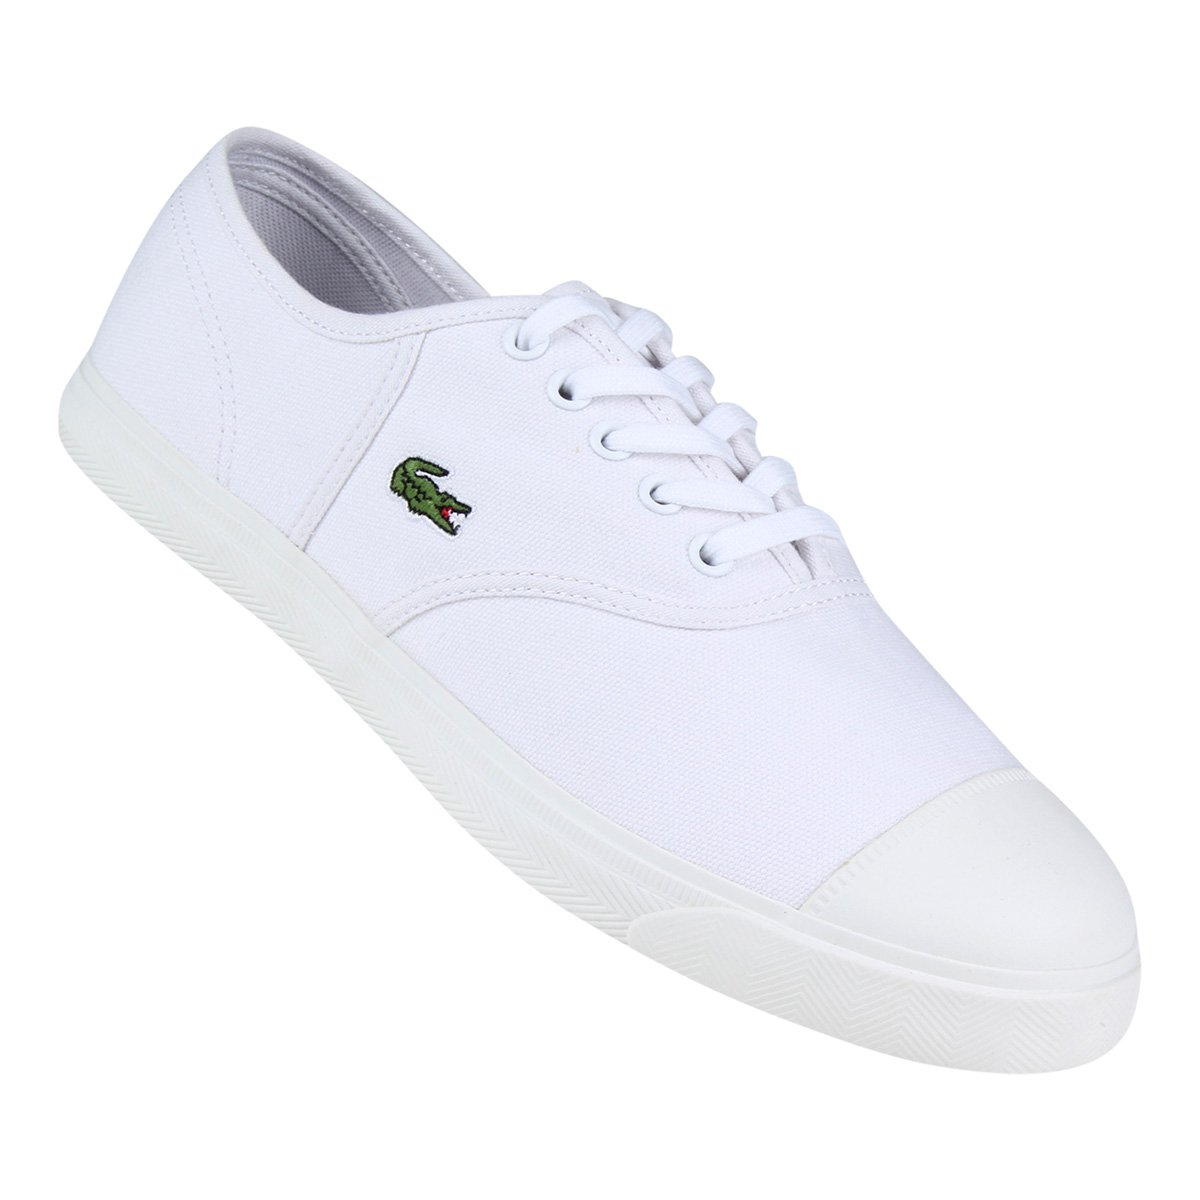 Tênis Lacoste René Feminino - Branco - Compre Agora   Netshoes a846e2e8d0